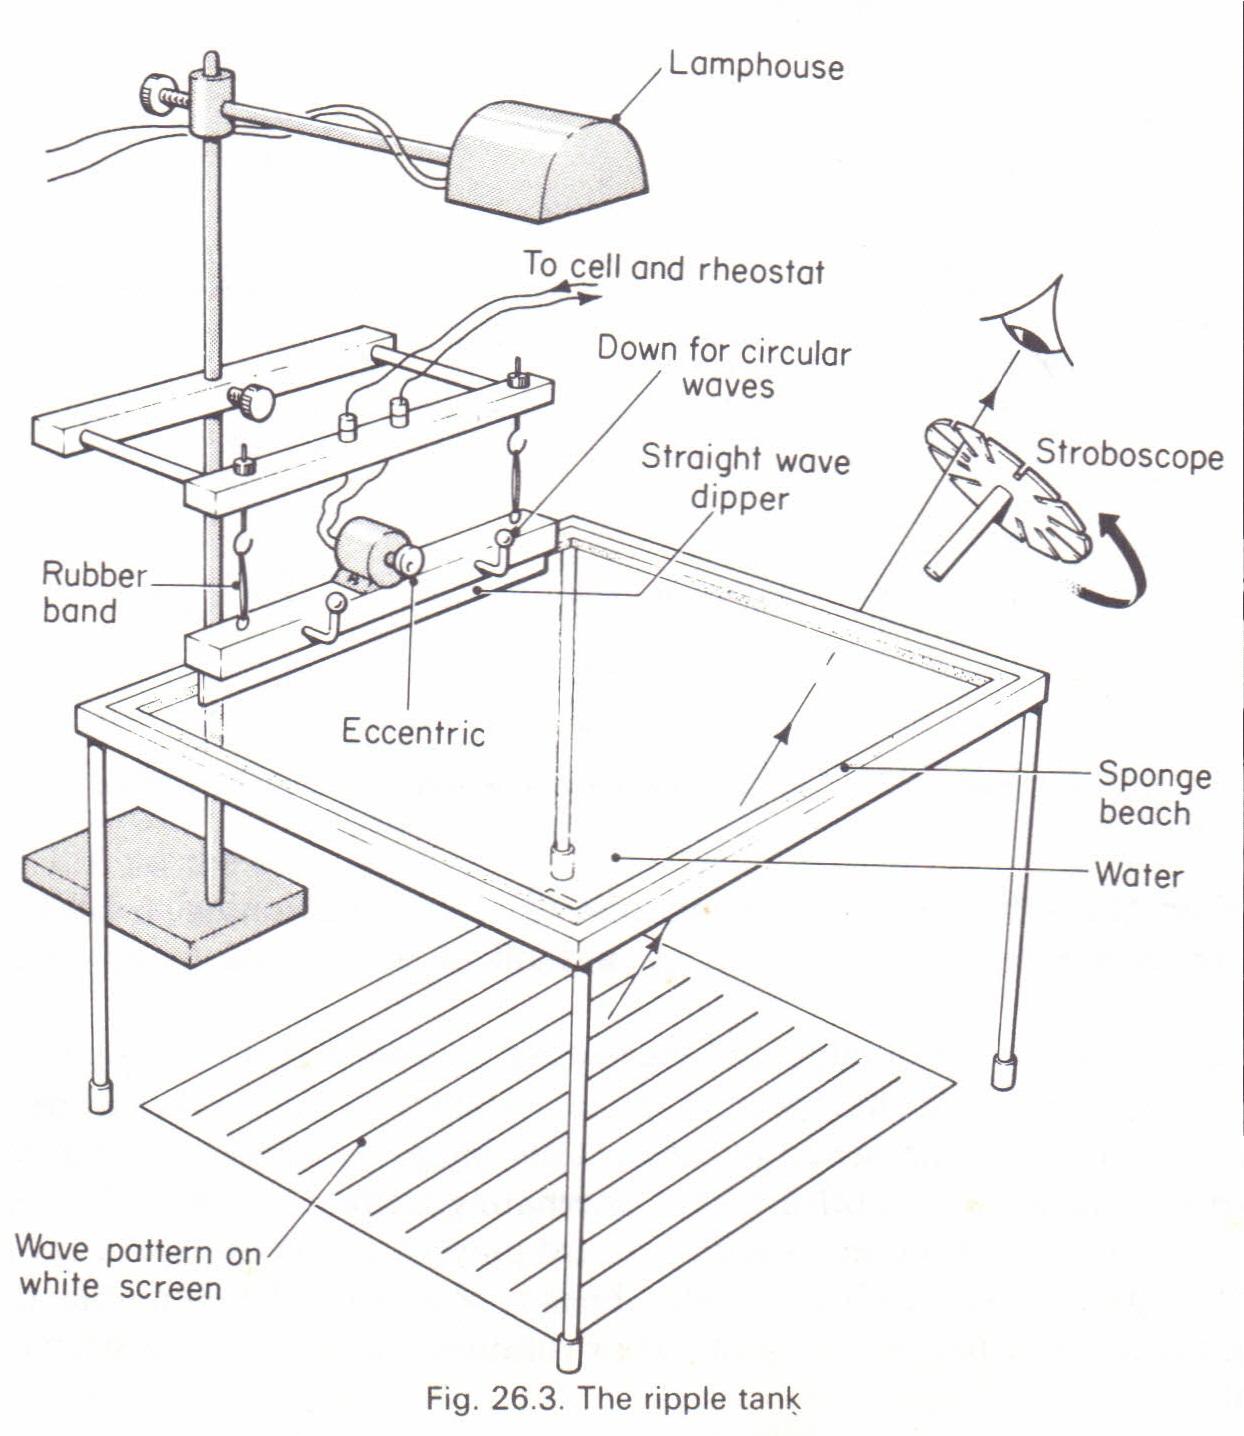 long and short sighted diagram ge top load washer wiring drawing lens diagrams imageresizertool com